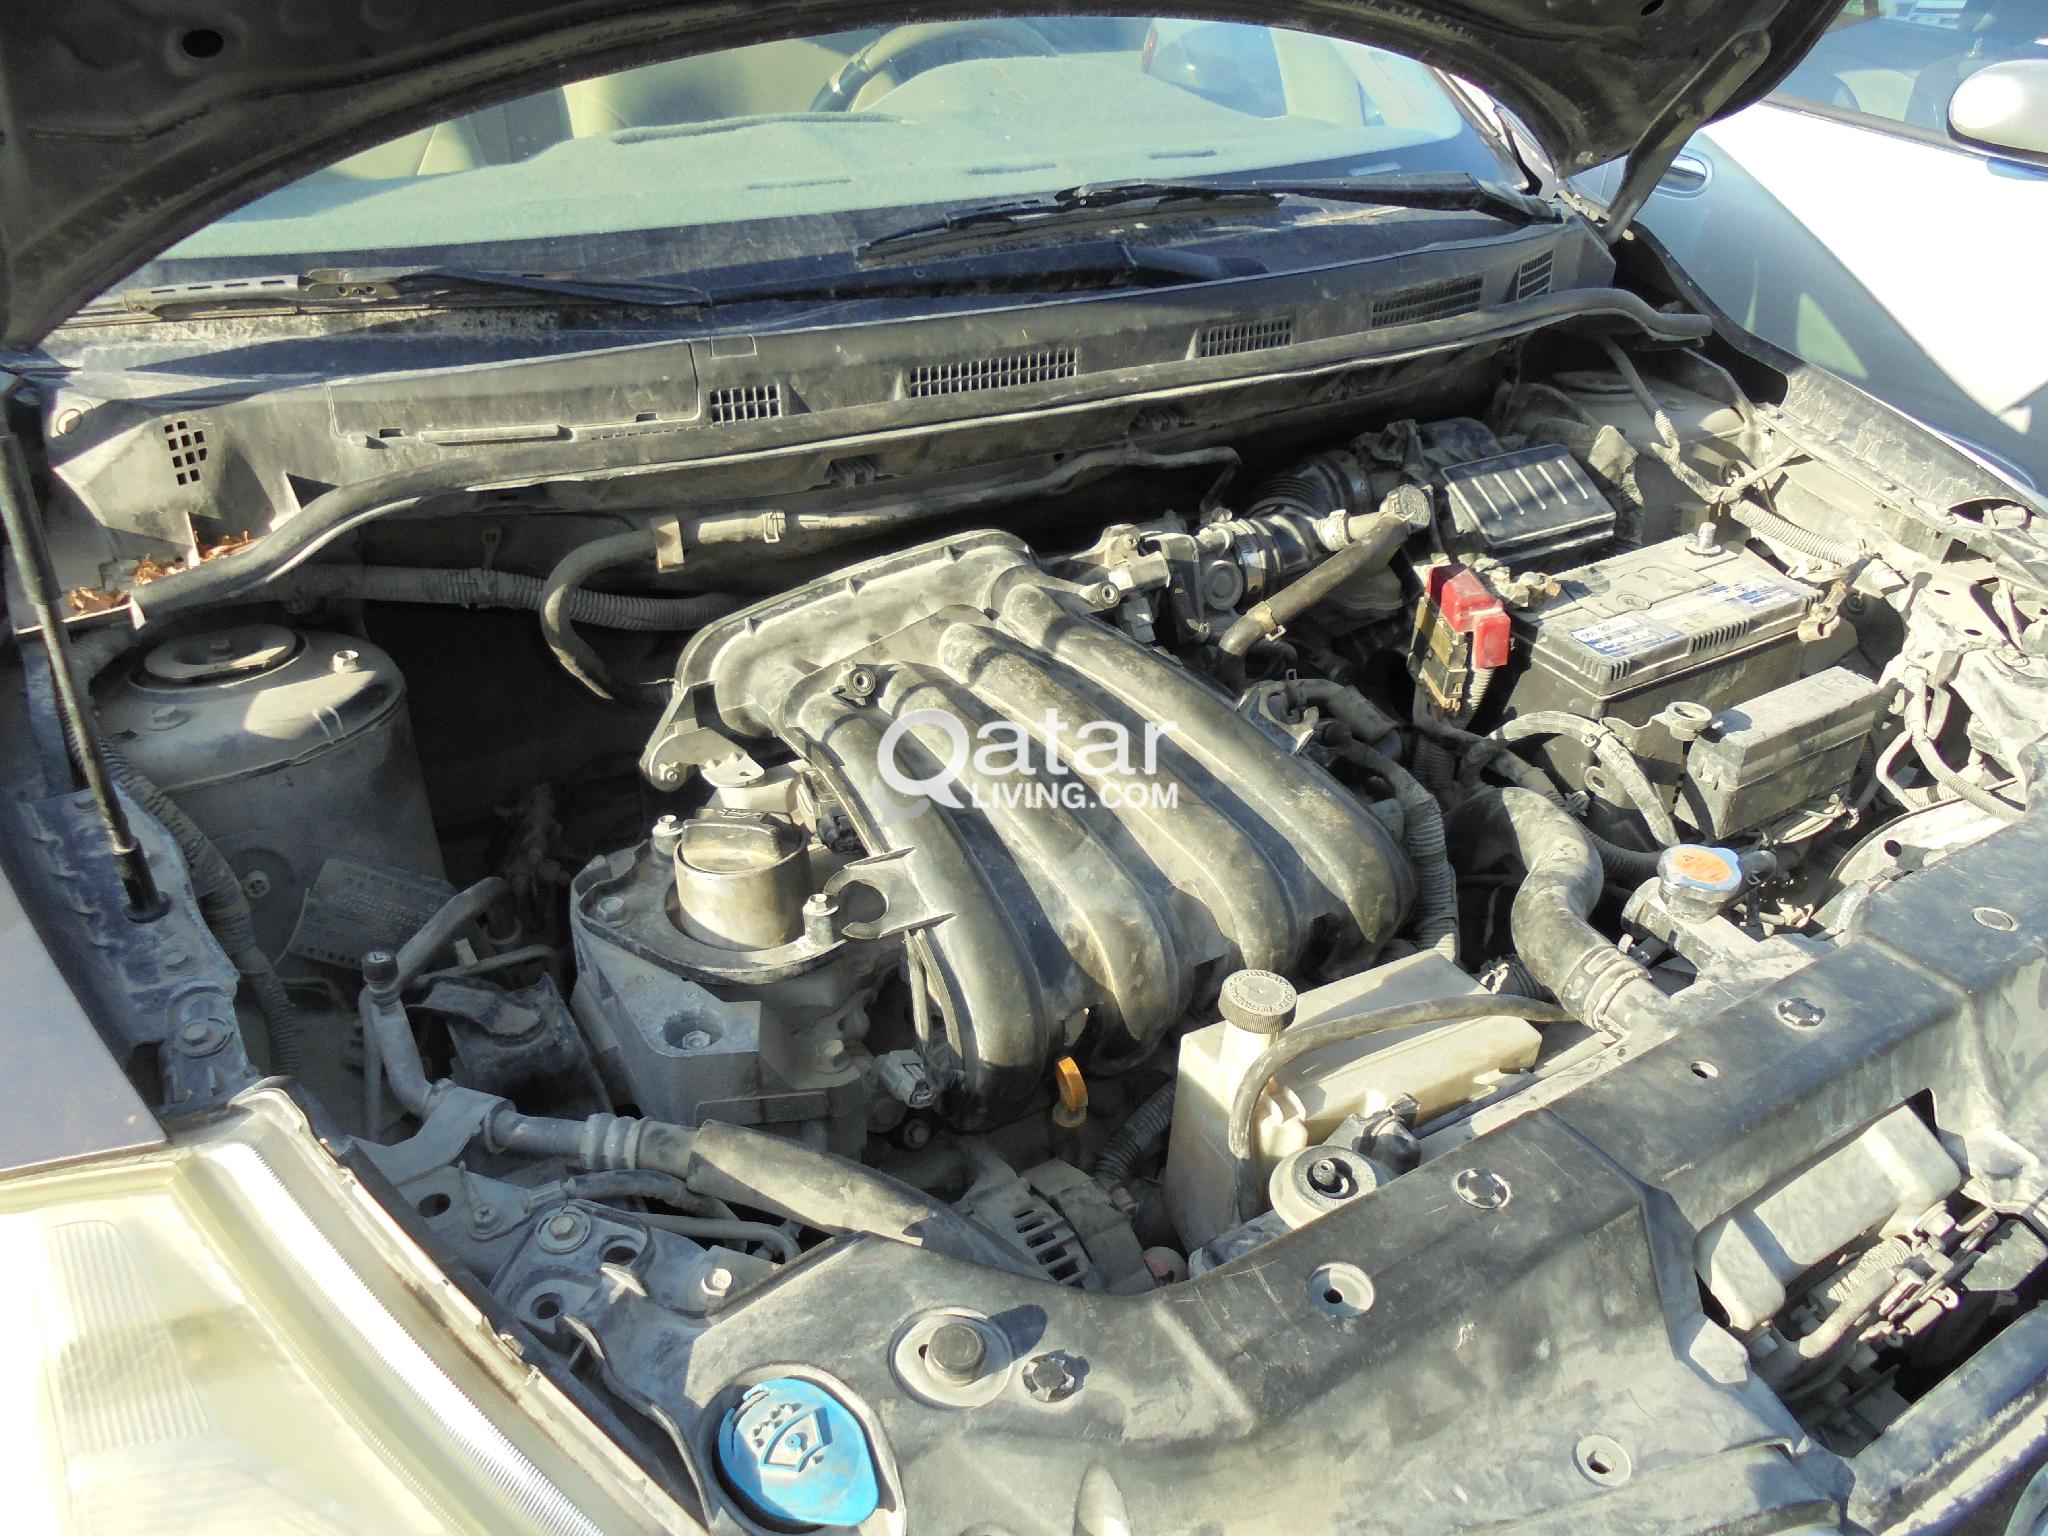 Tiida 2008 Scrap Oll Parts Sell Engine Gear box AC